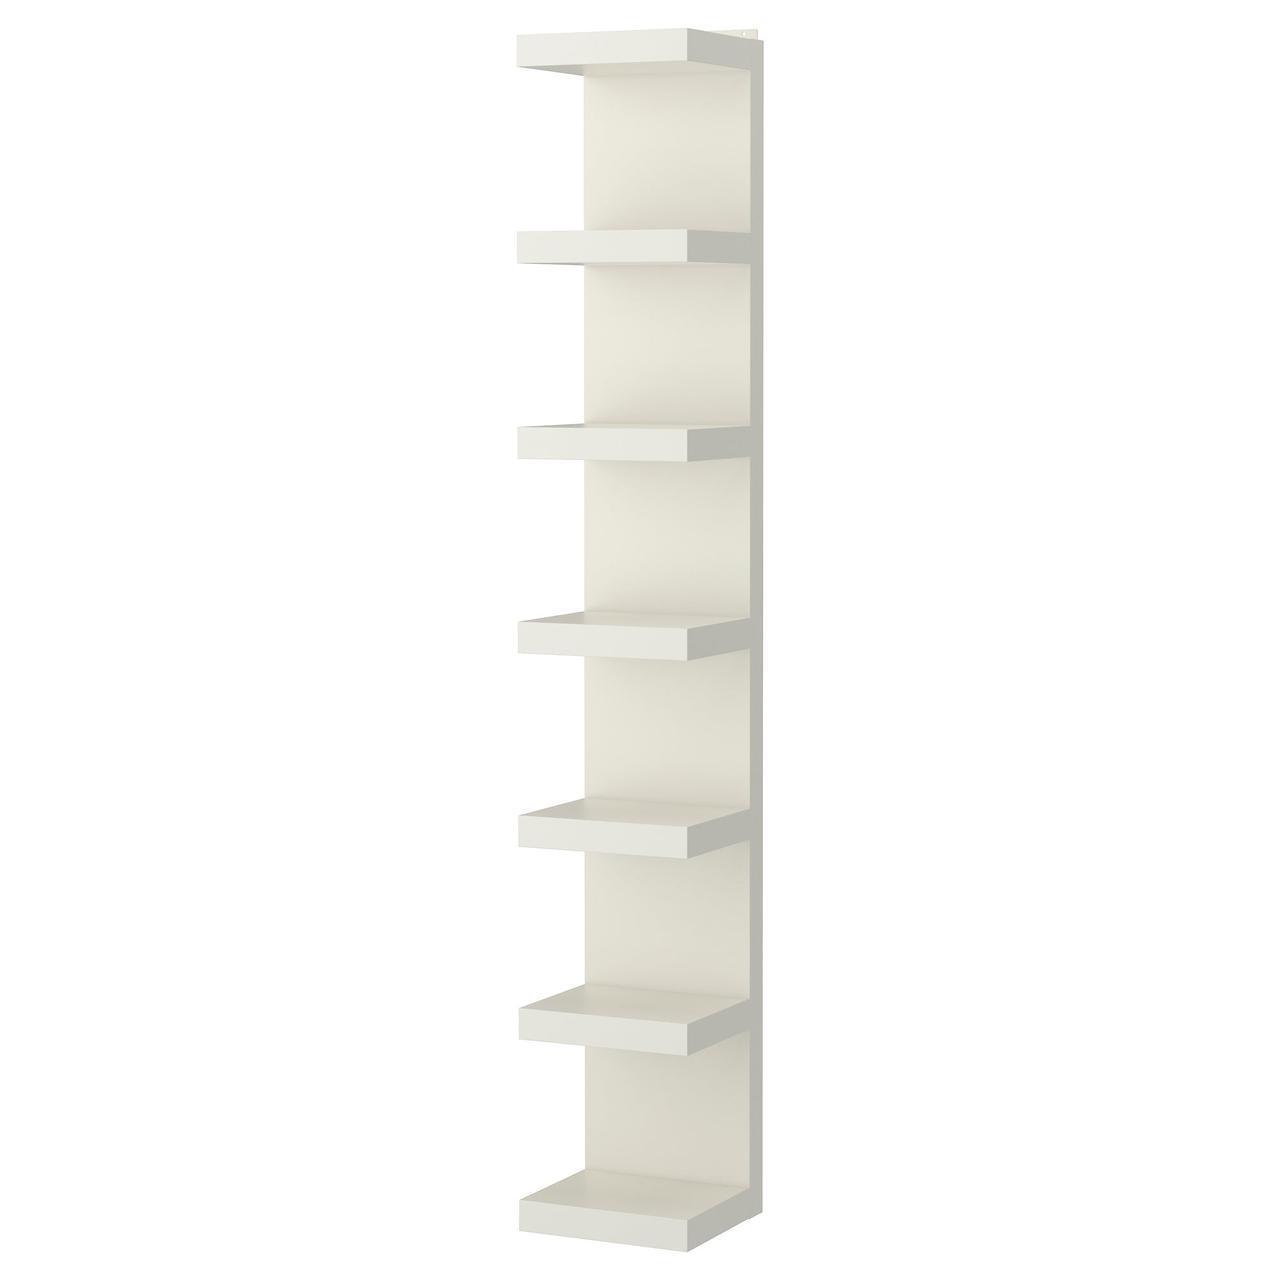 IKEA LACK (602.821.86) Настенная полка, белая